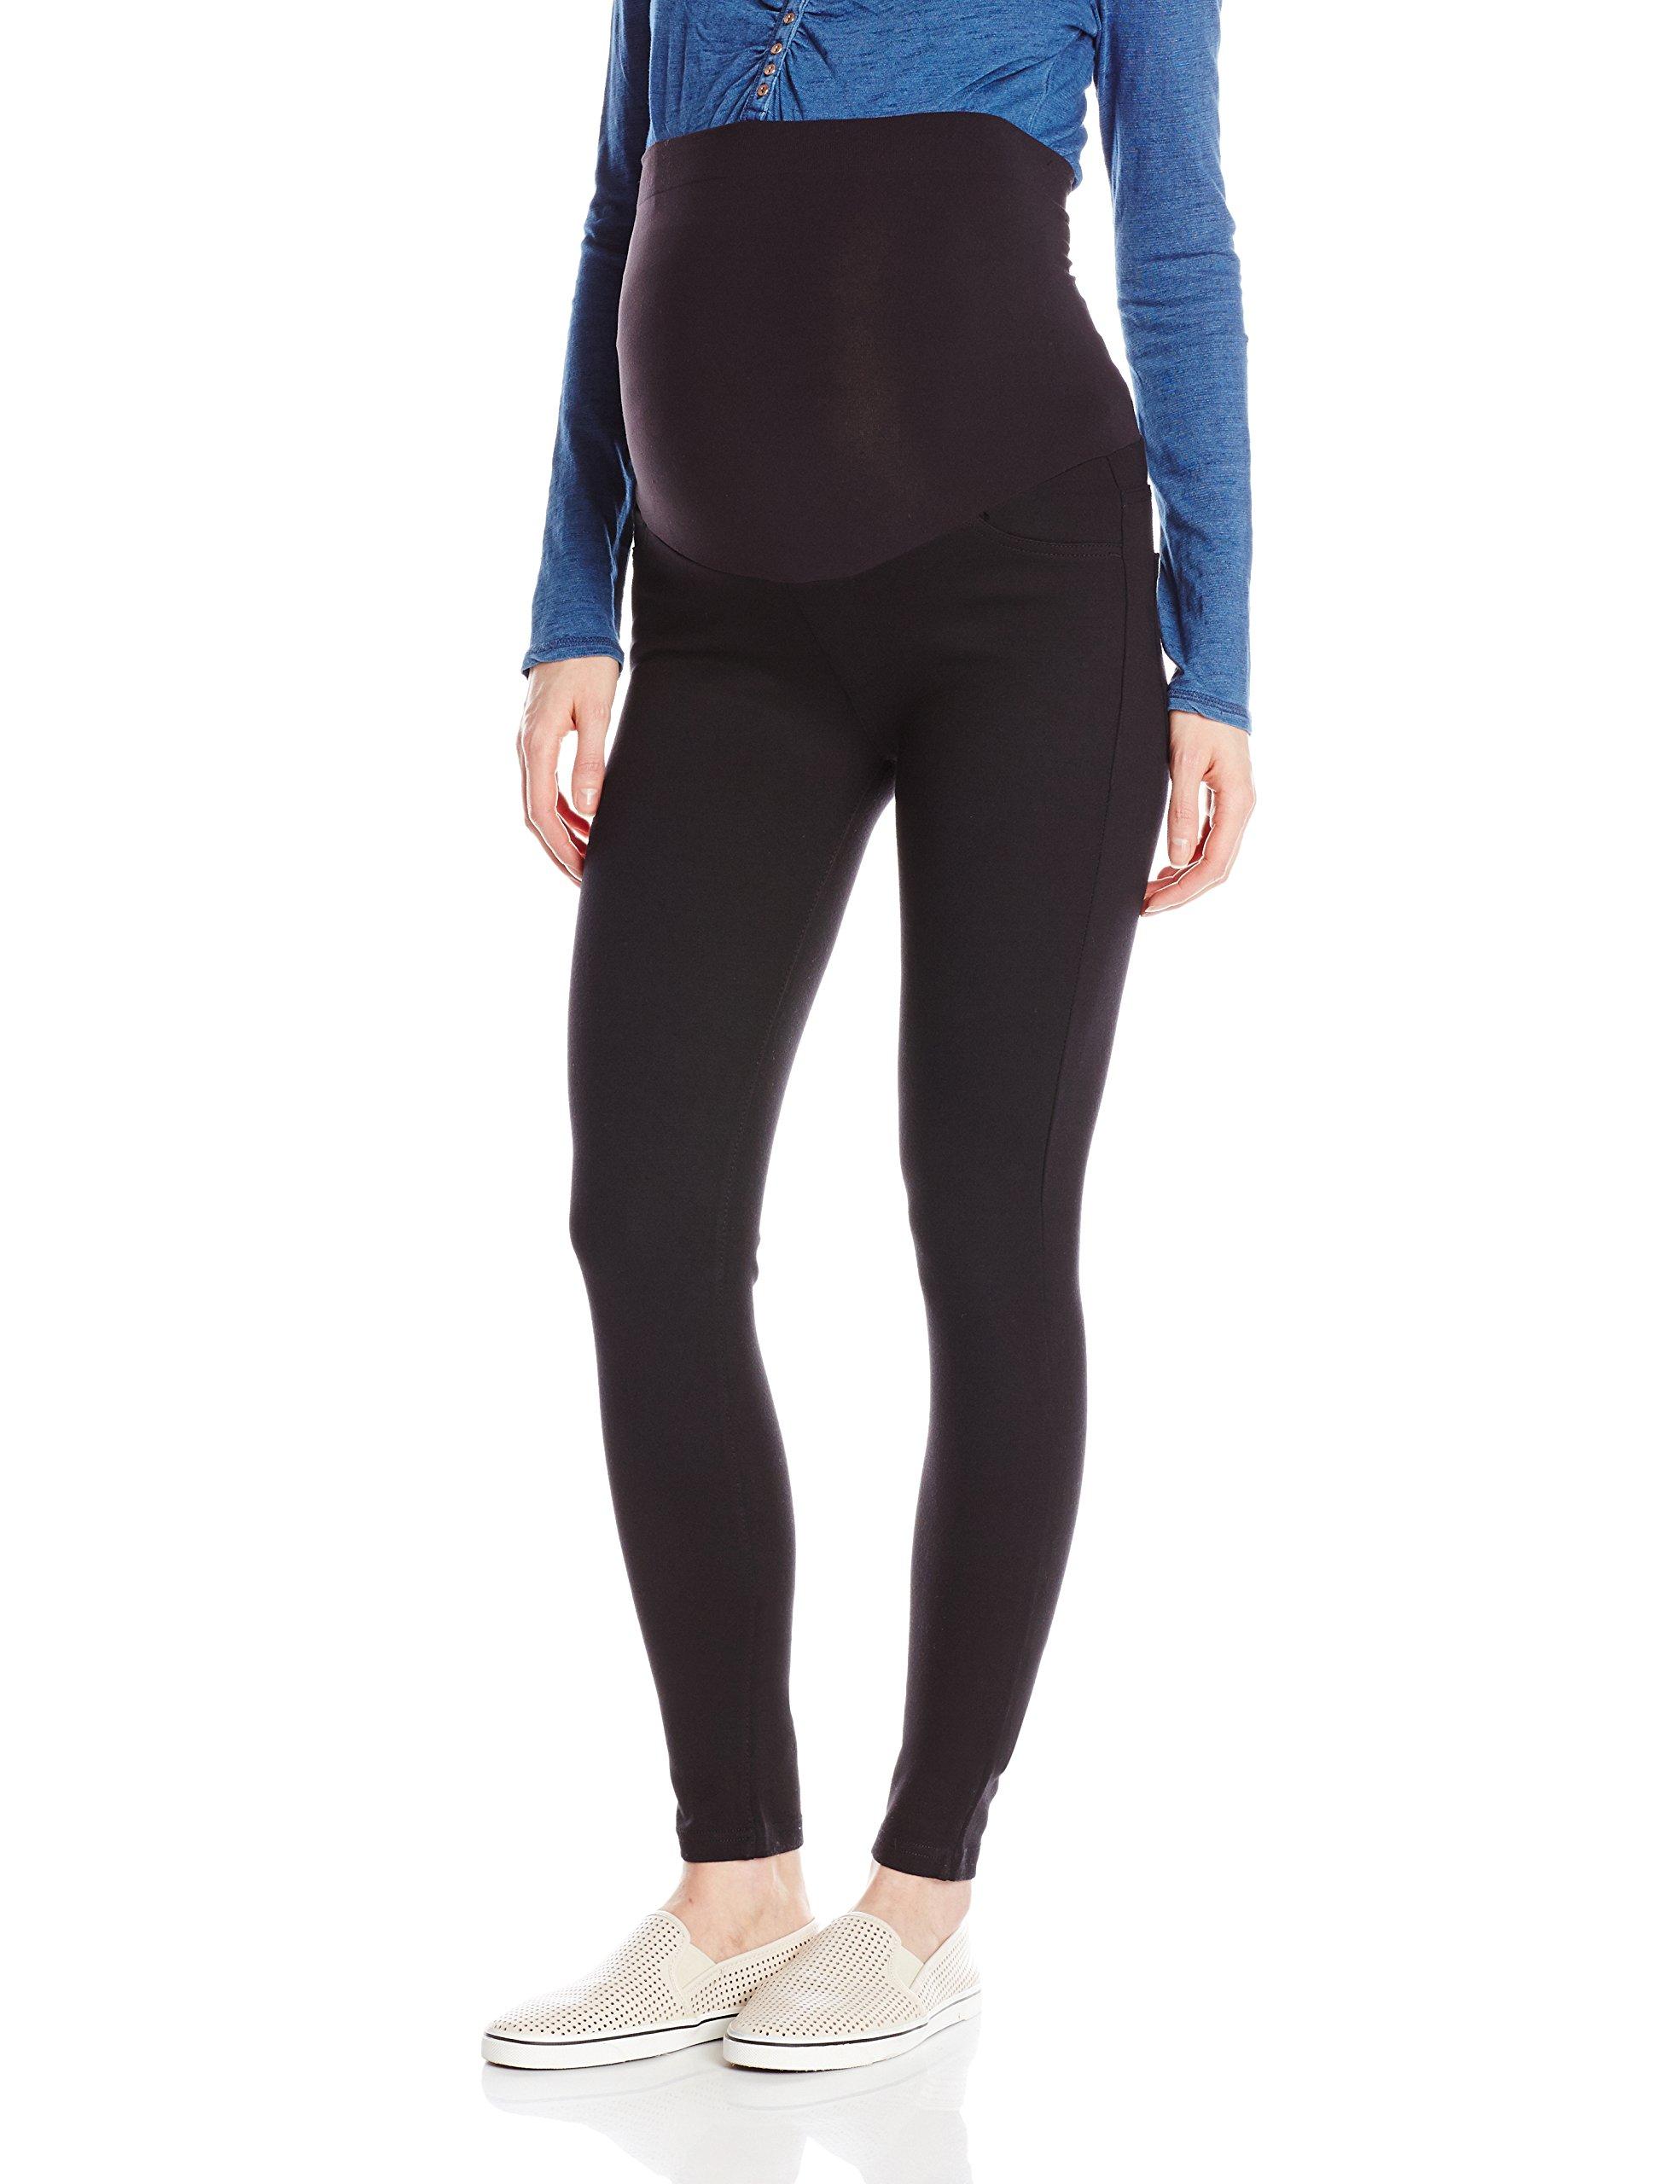 Ingrid & Isabel Women's Maternity Ponte Skinny Pants, Jet Black, Size 4